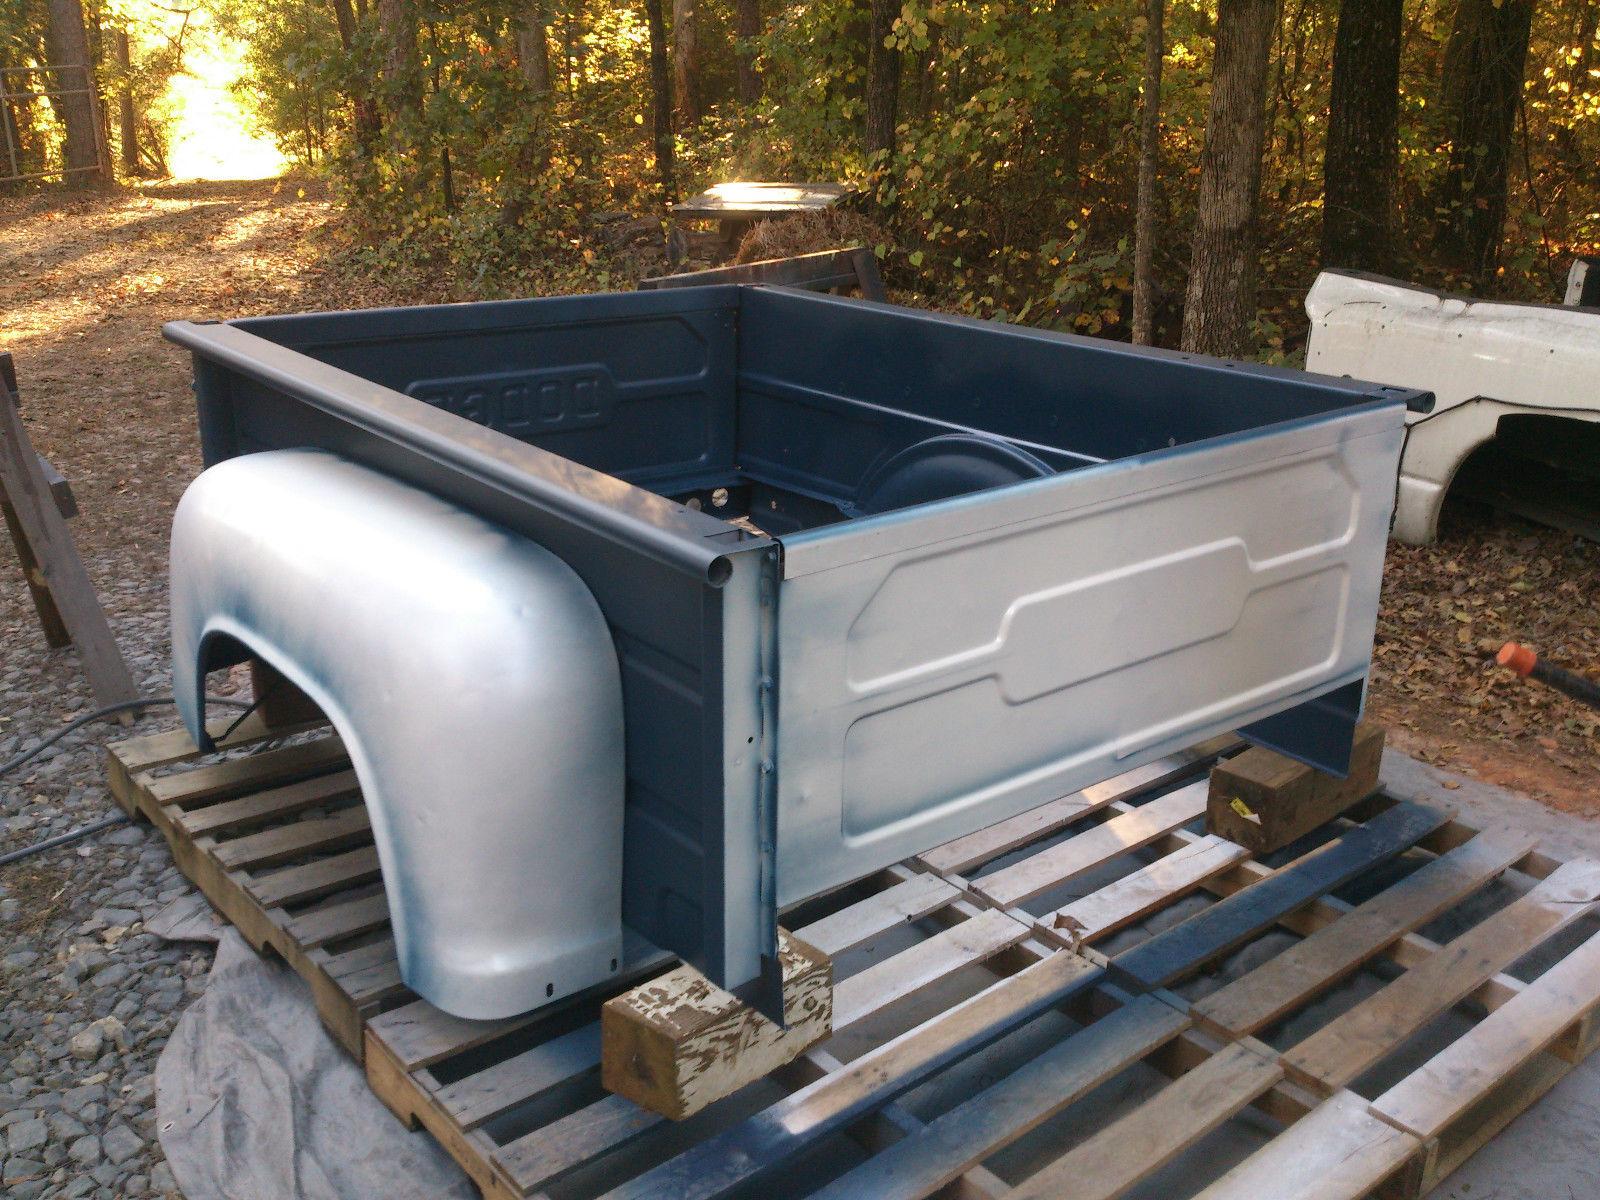 1969 Dodge W 200 Power Wagon Air Force Truck Crew Cab Slant Six 225 For Sale Np 435 4x4 In Bogart Georgia United States